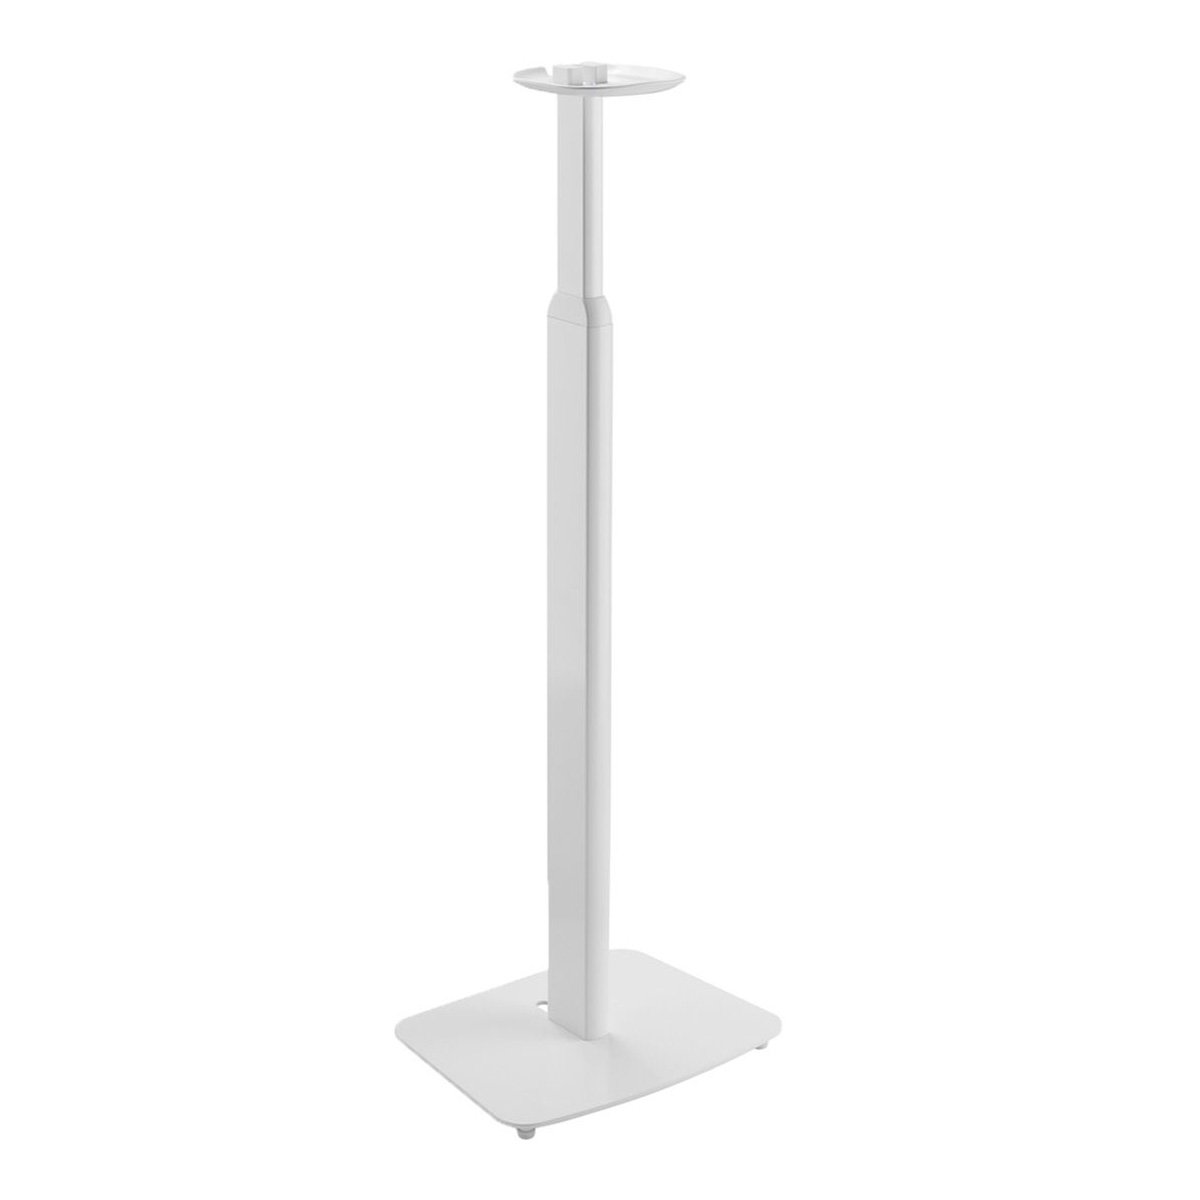 S1-FLR2-WH White SONOS Speaker Stand